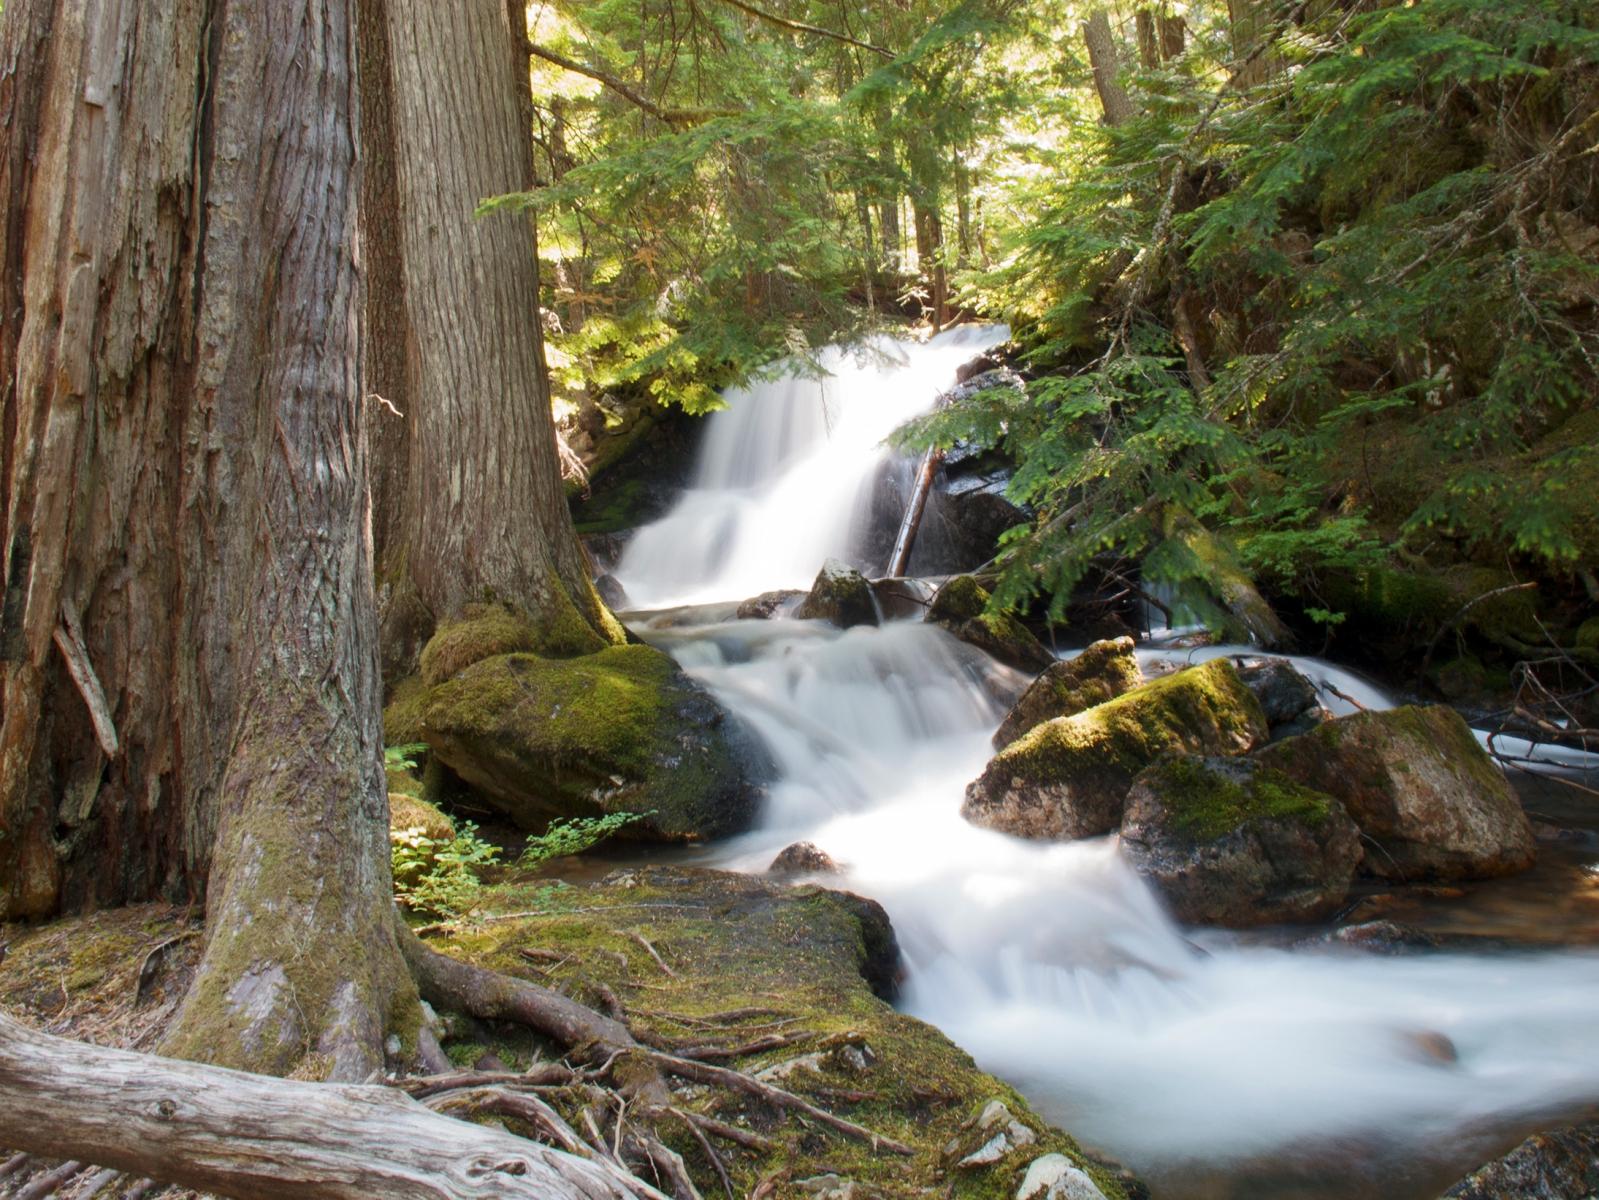 2 second waterfall exposure